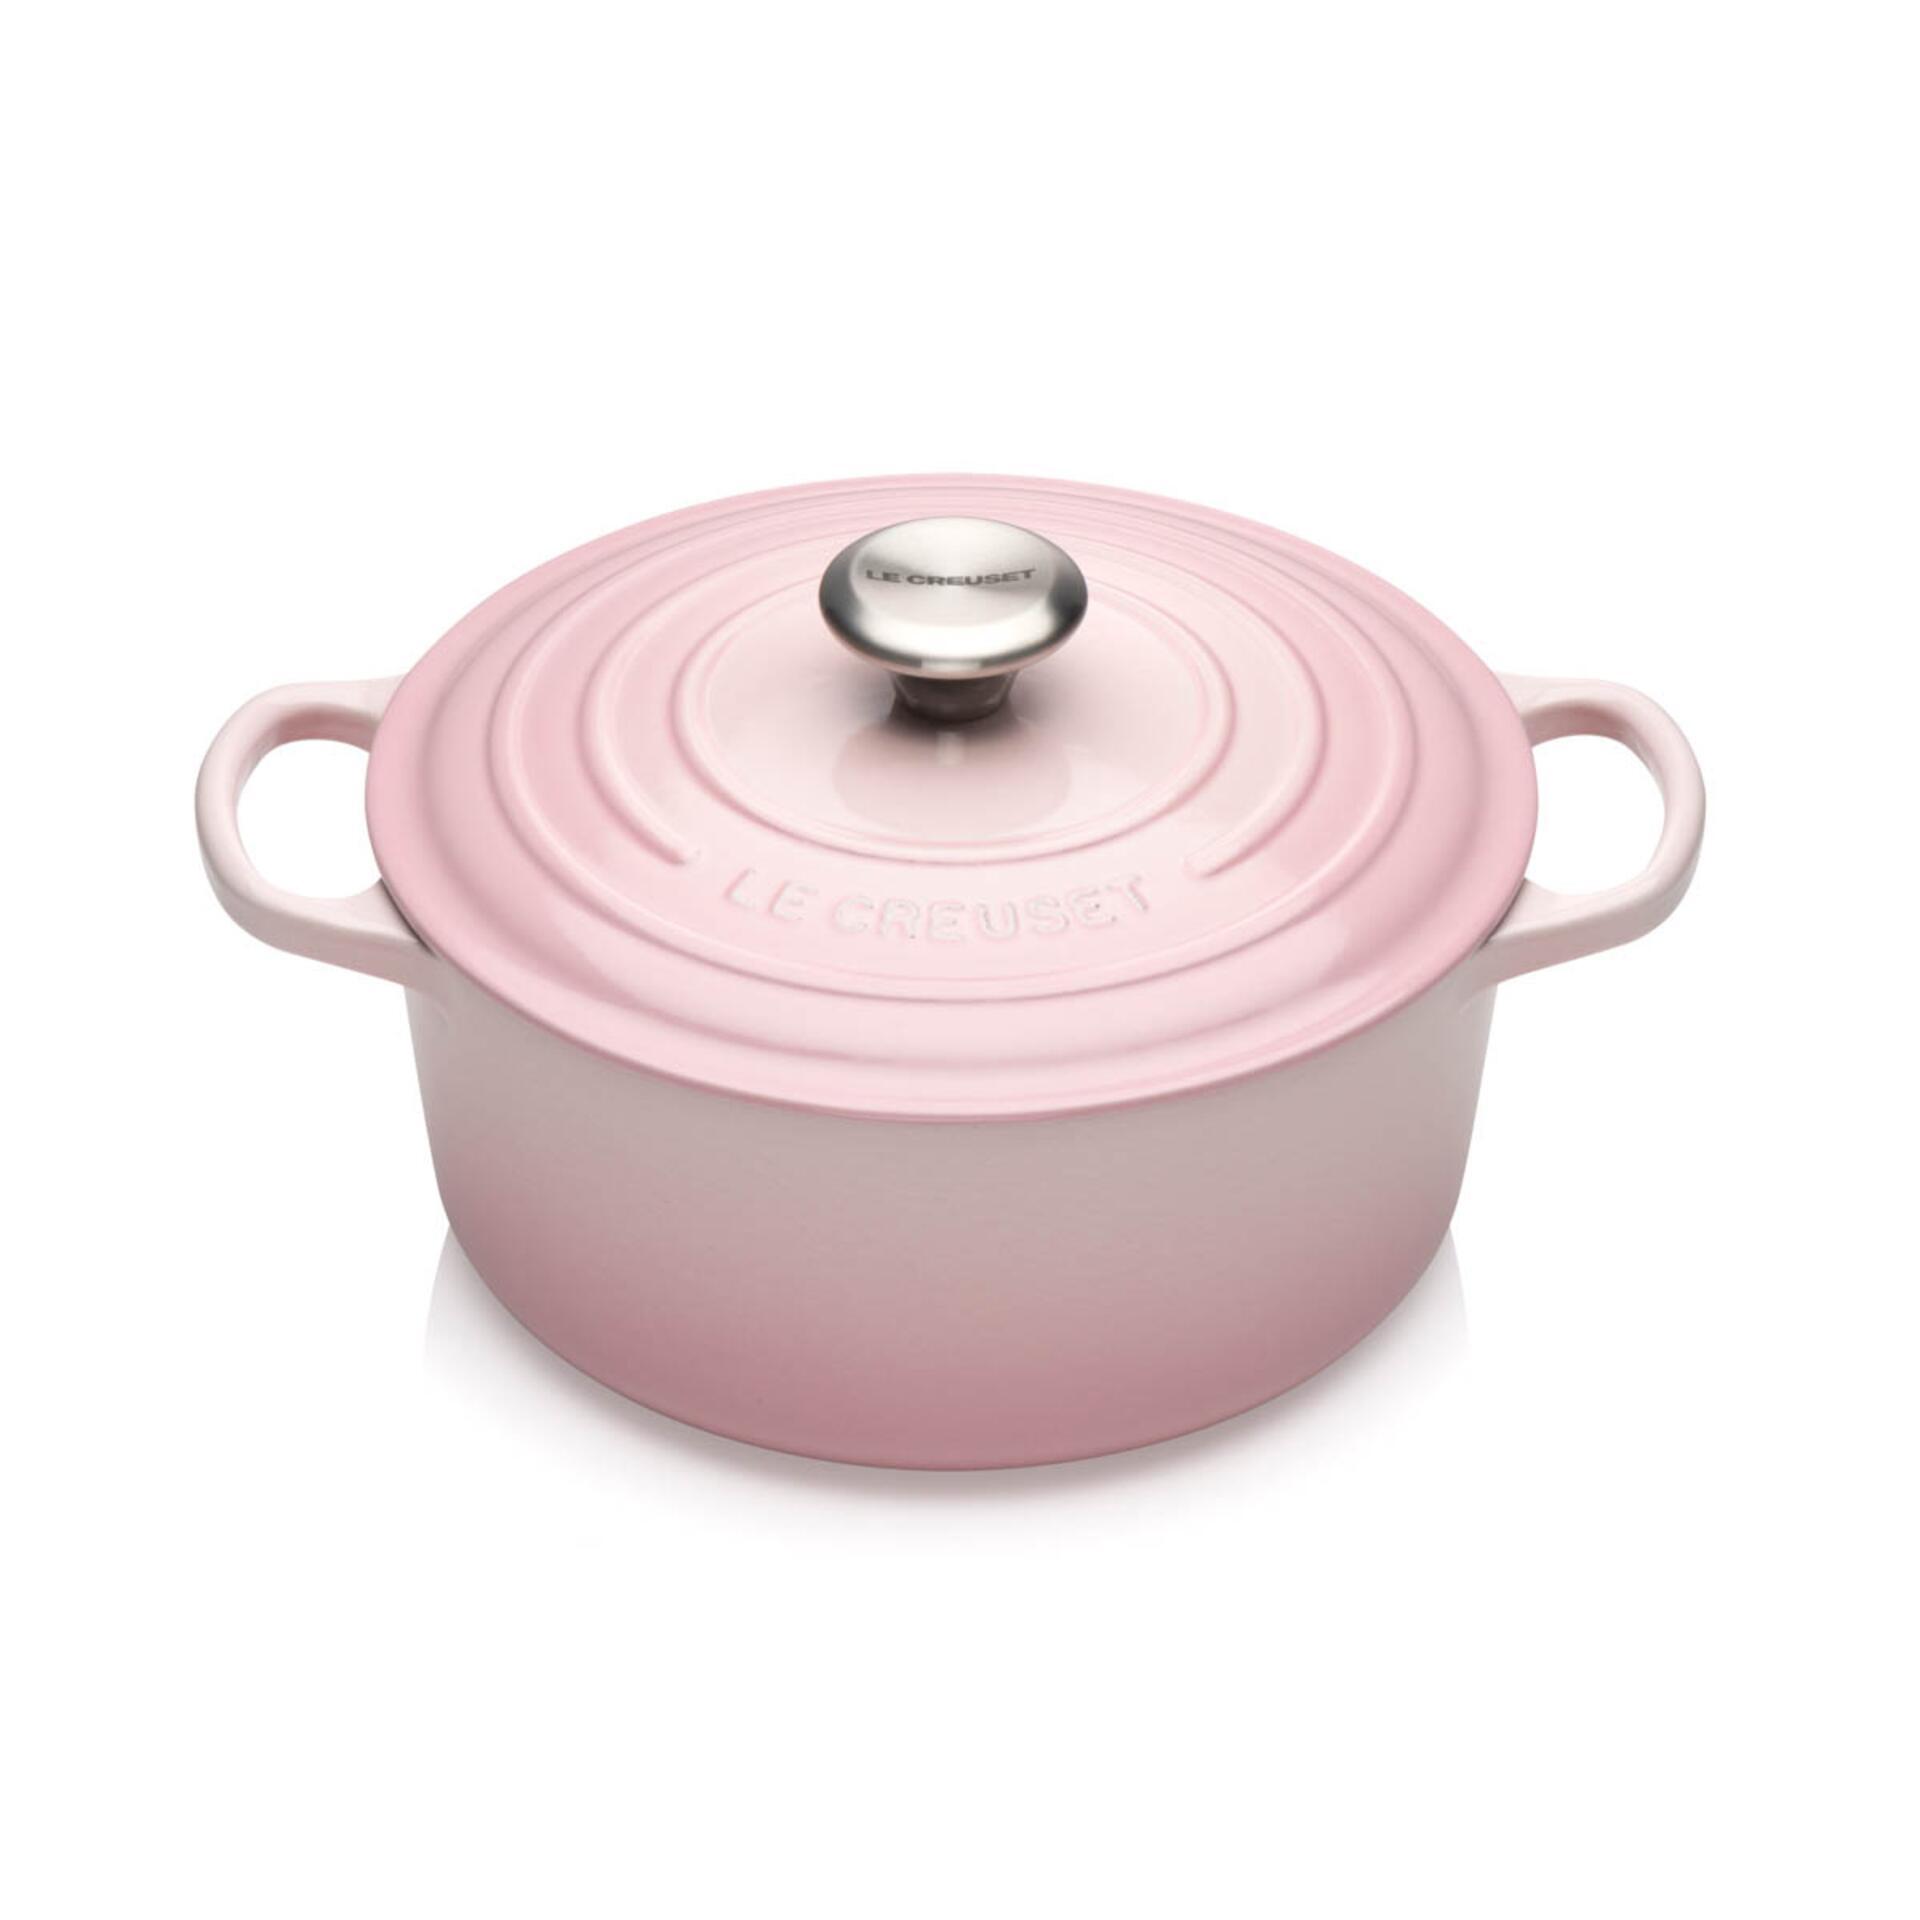 Le Creuset Bräter Signature 20 cm Shell Pink